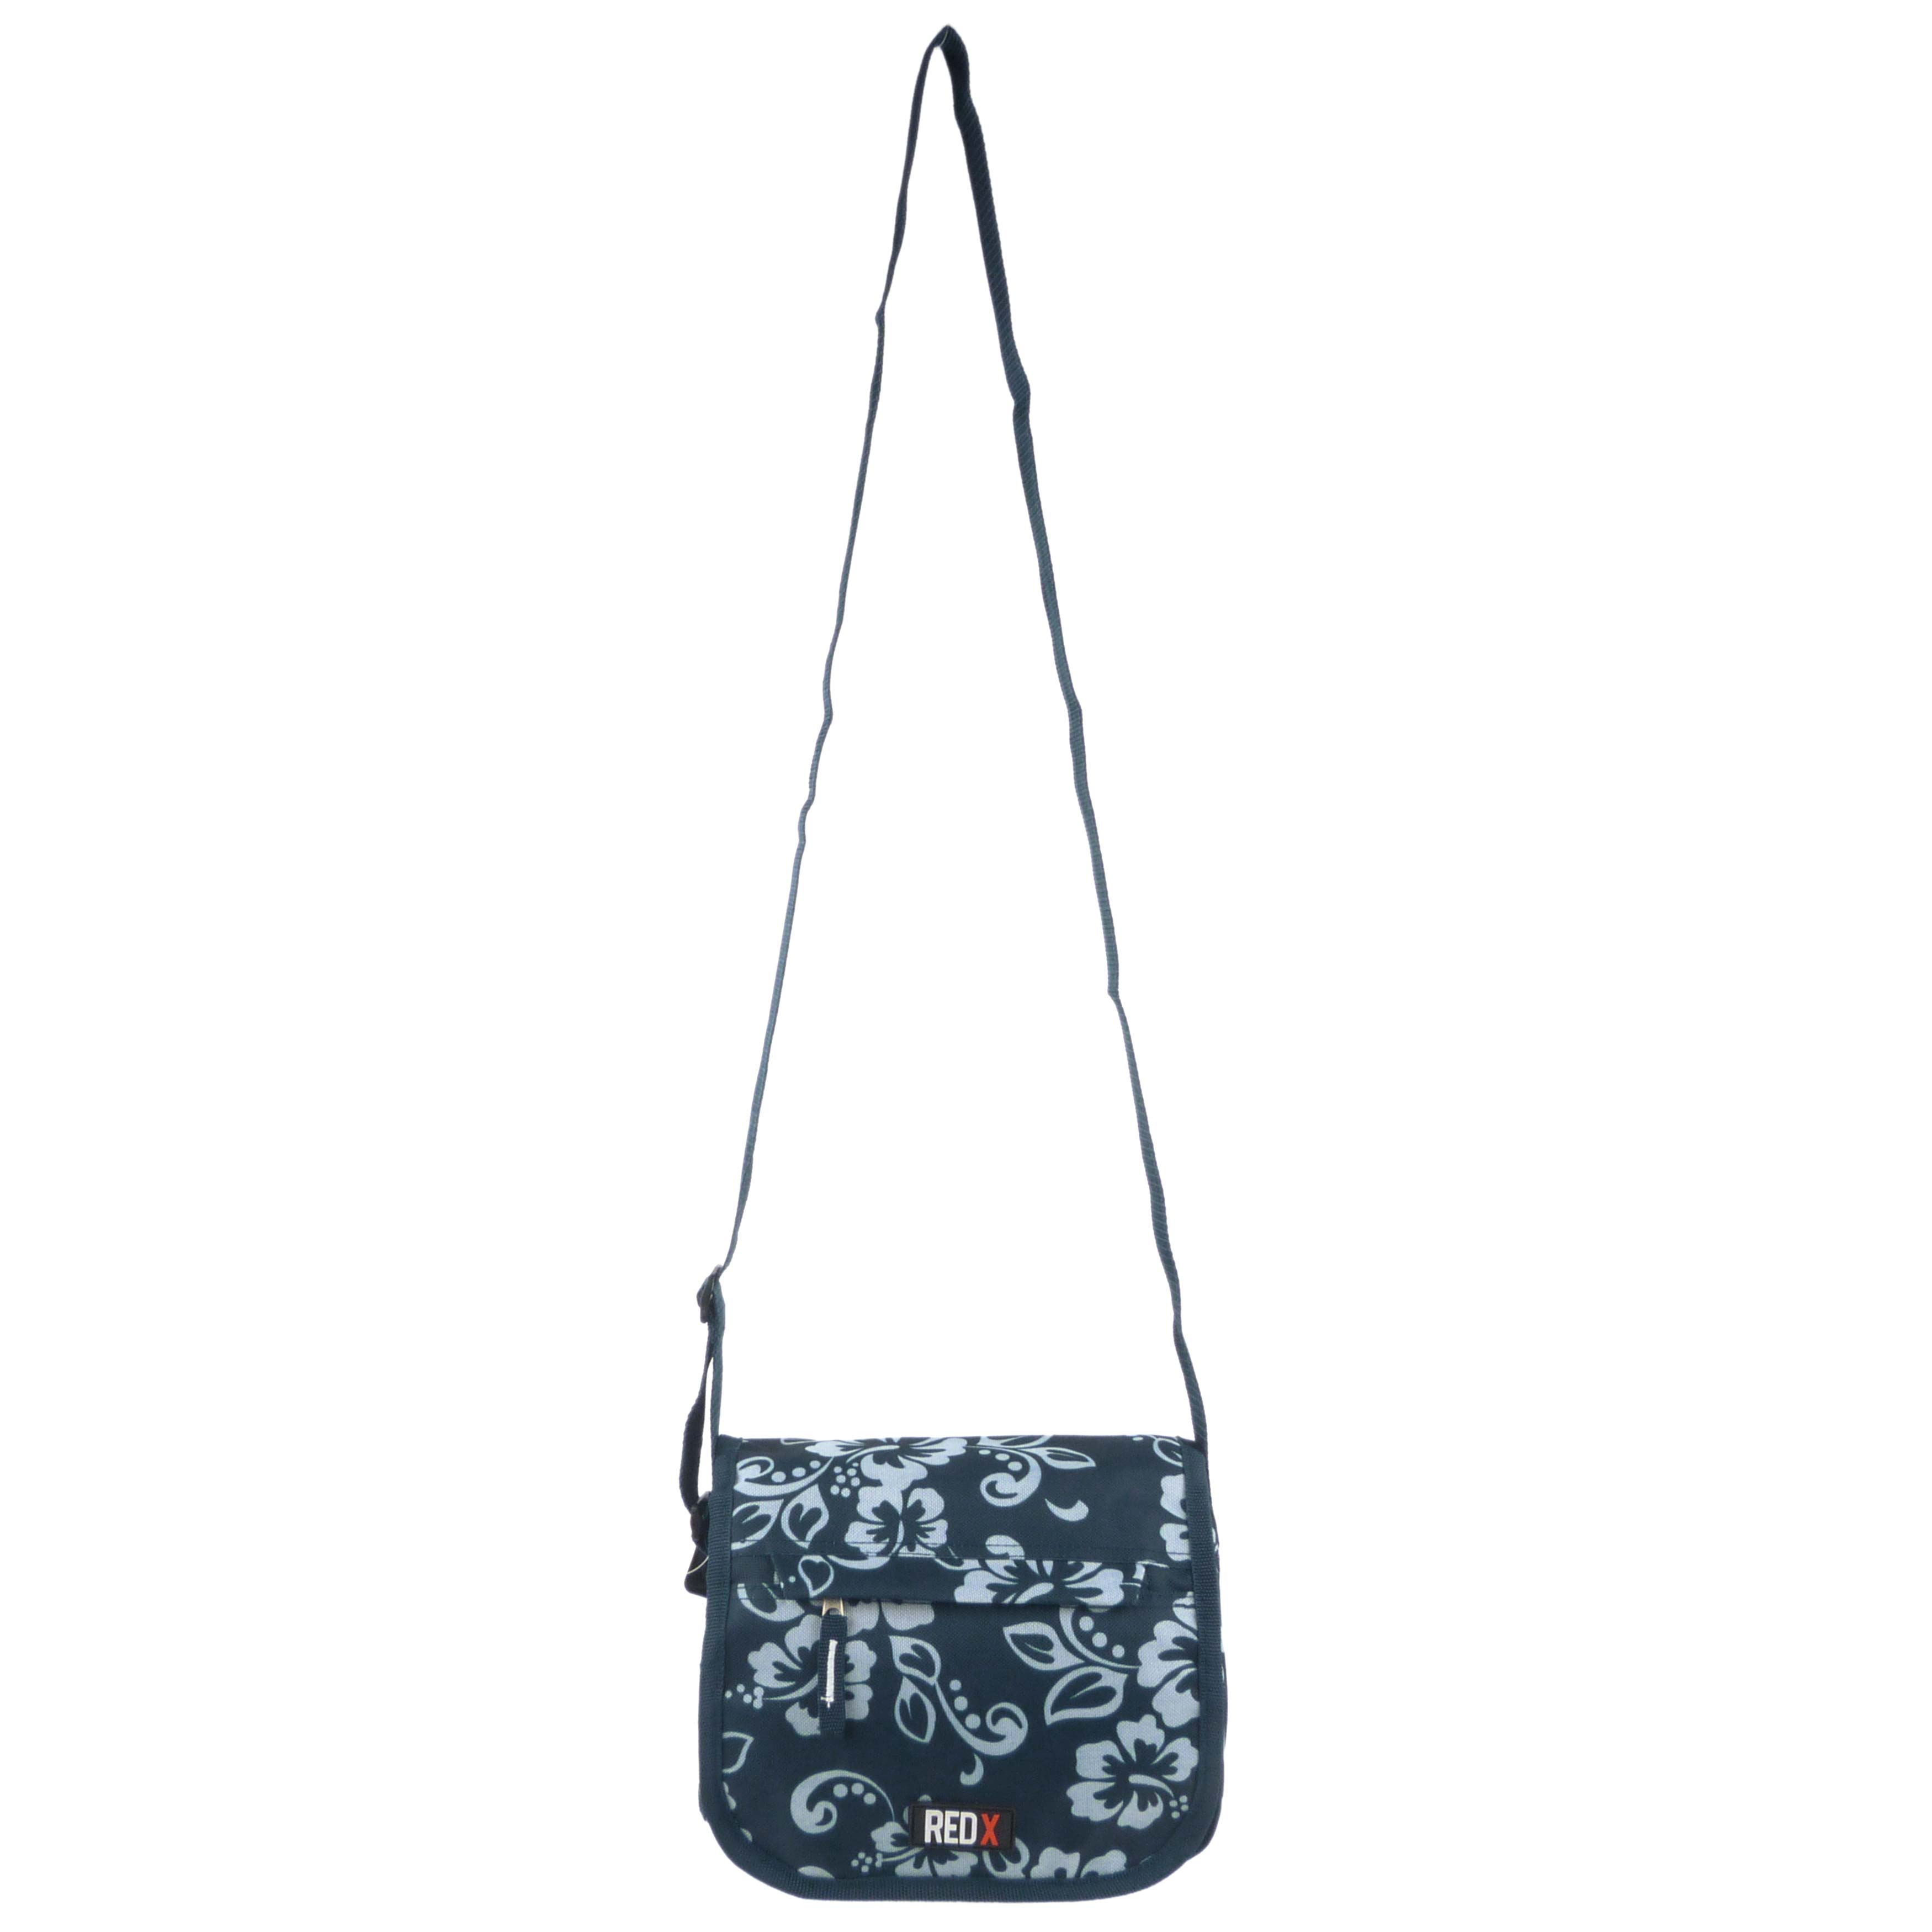 Ladies-Girls-Medium-Hibiscus-Shoulder-Travel-Cross-Body-Bag-by-RED-X-Floral thumbnail 4